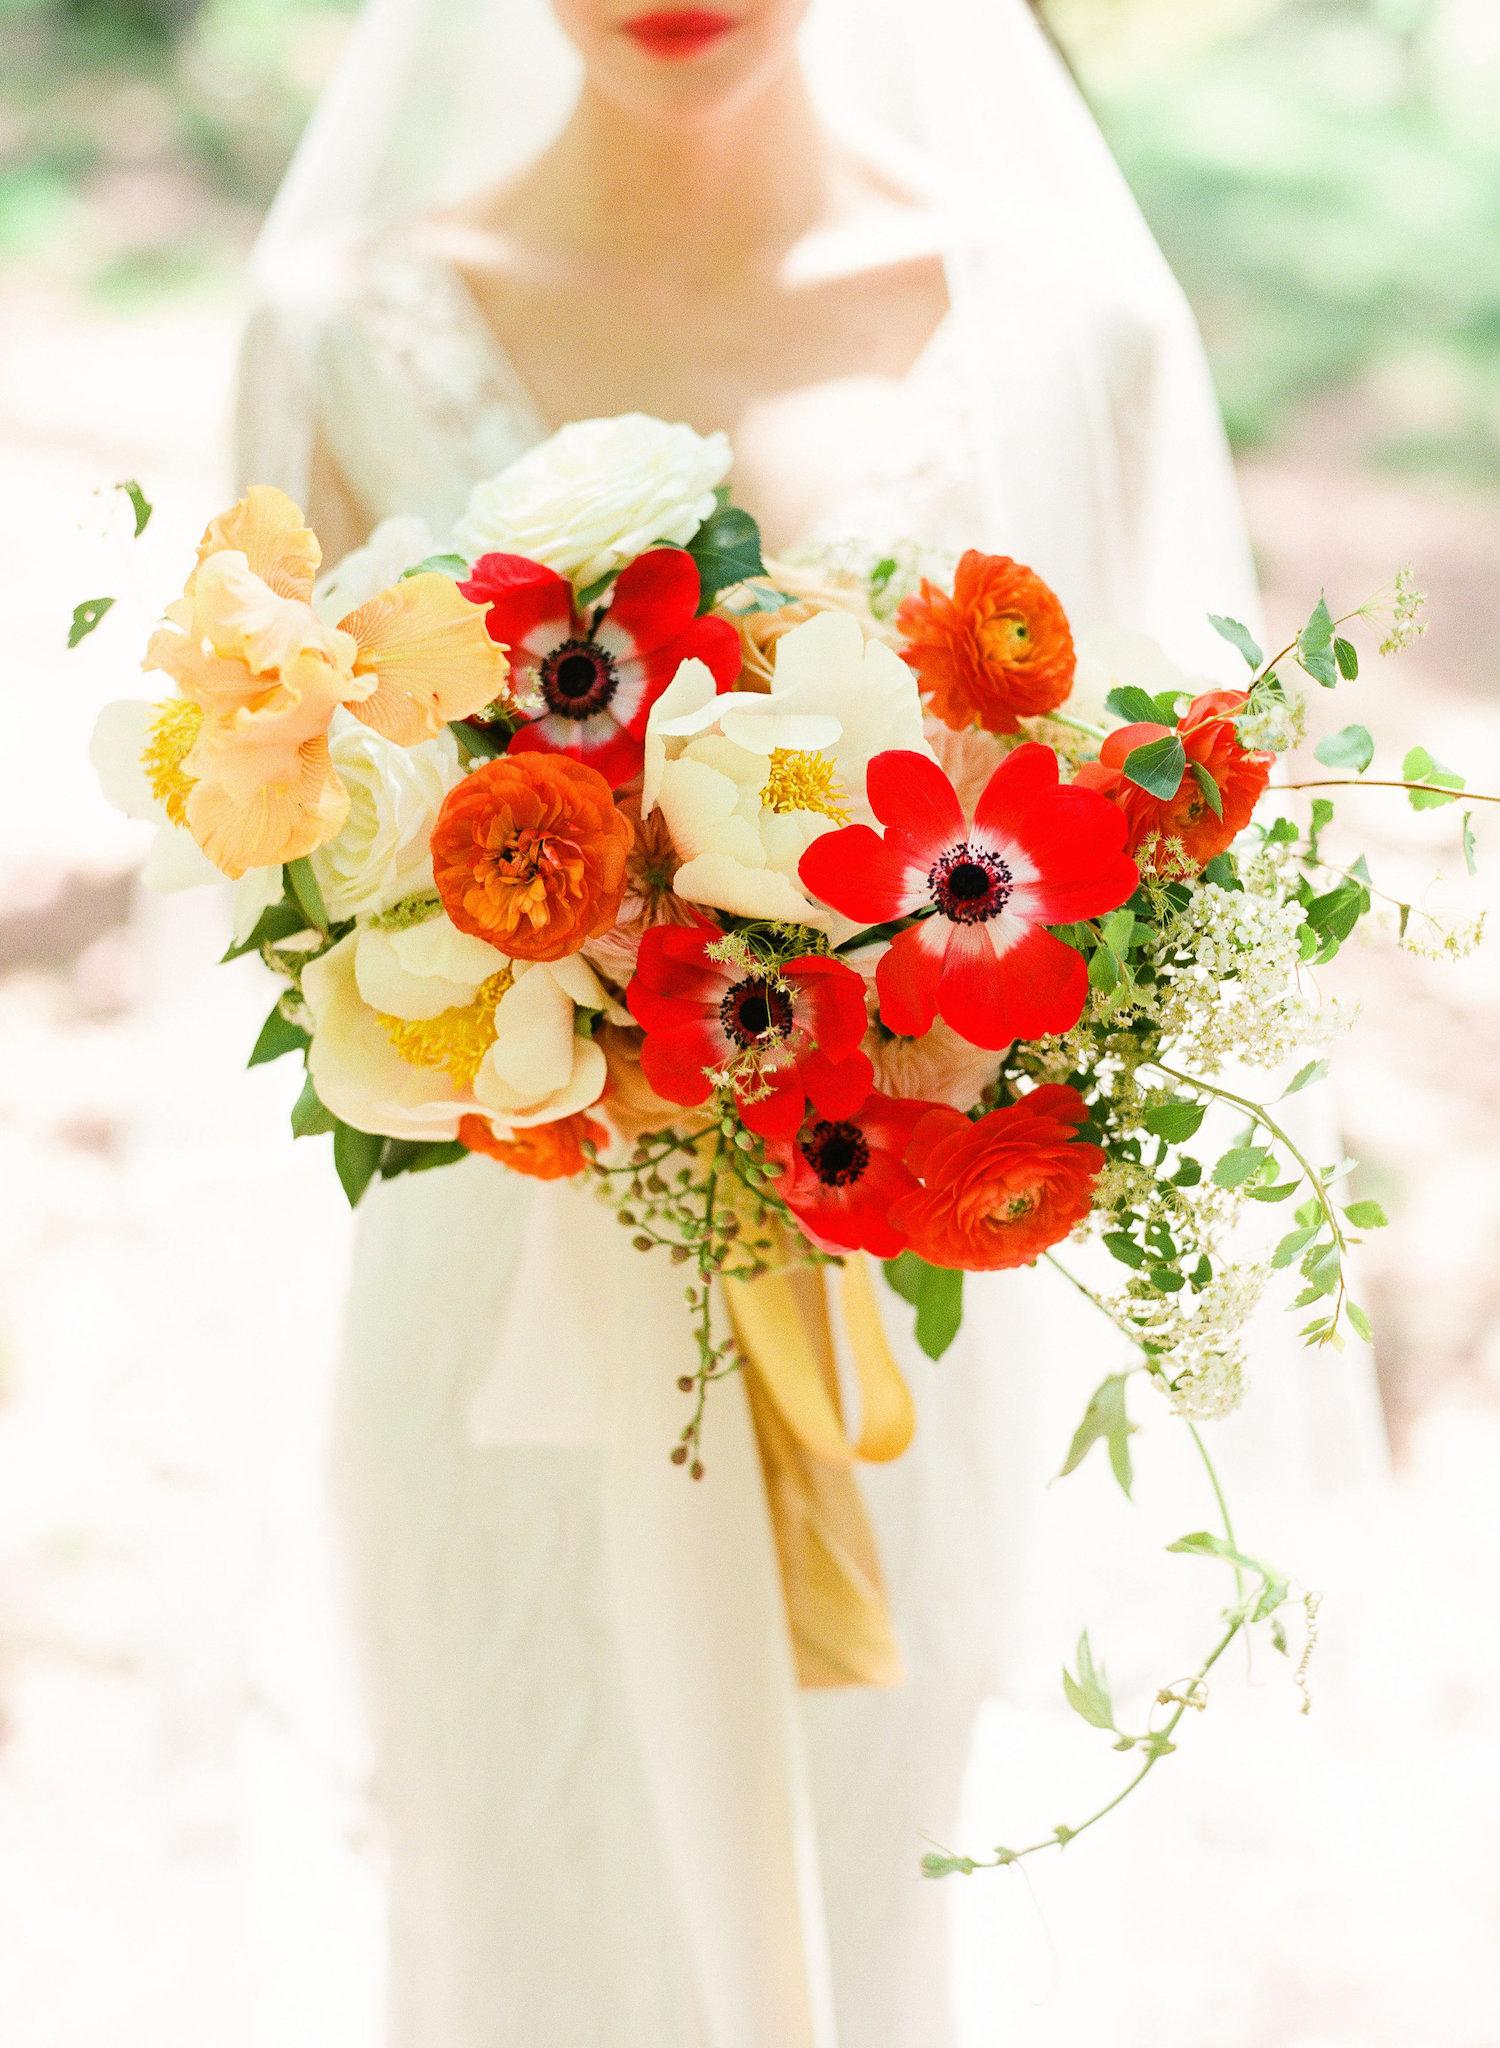 Morning Glow - Full Aperture Floral & Lindsay Madden Photography 8.jpeg